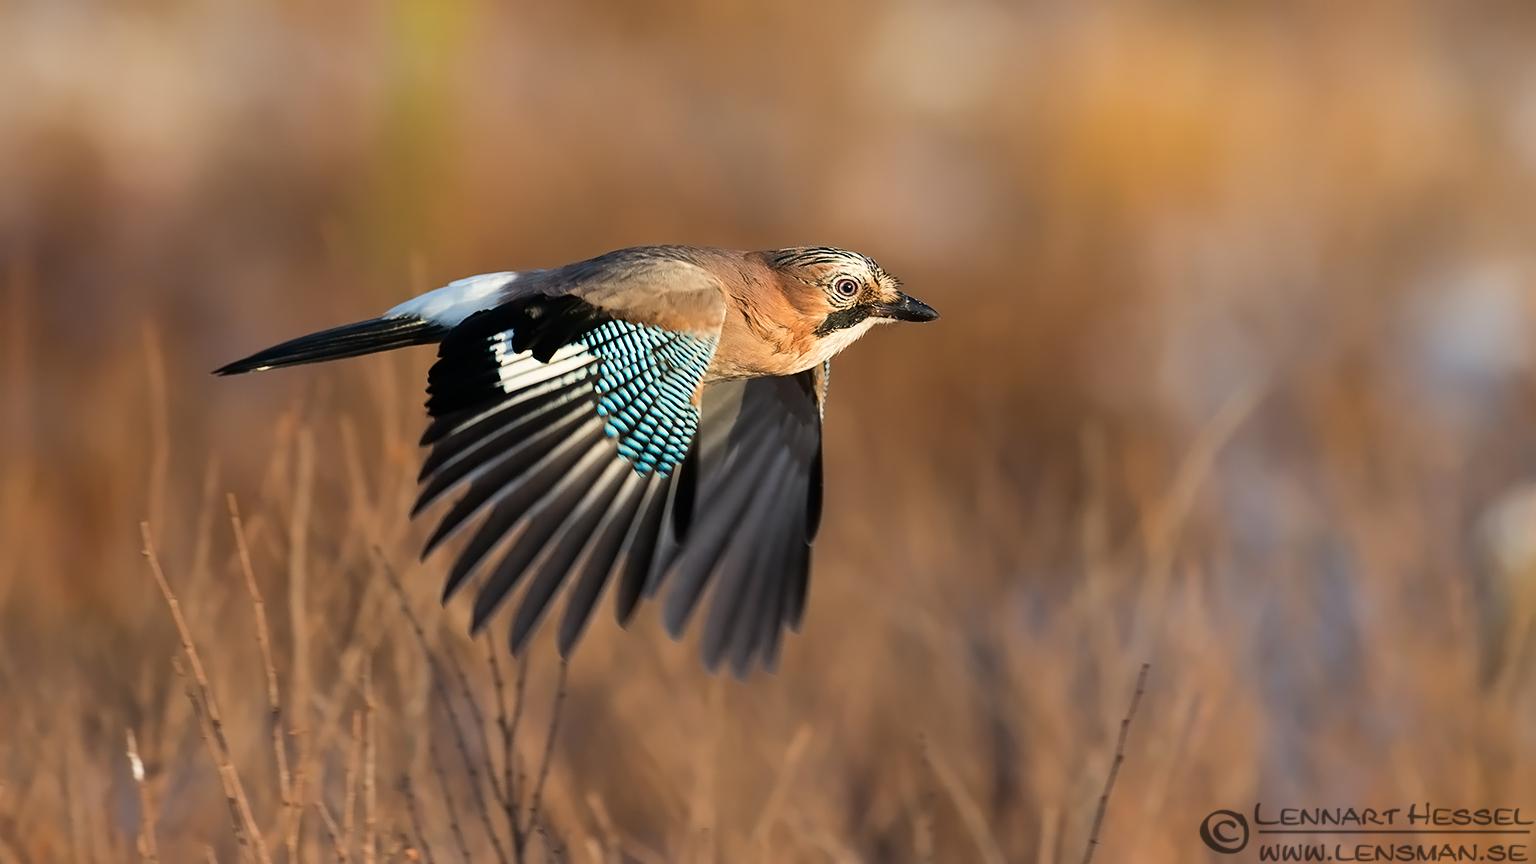 Eurasian Jay, photo from Kalvträsk. National Geographic wild bird